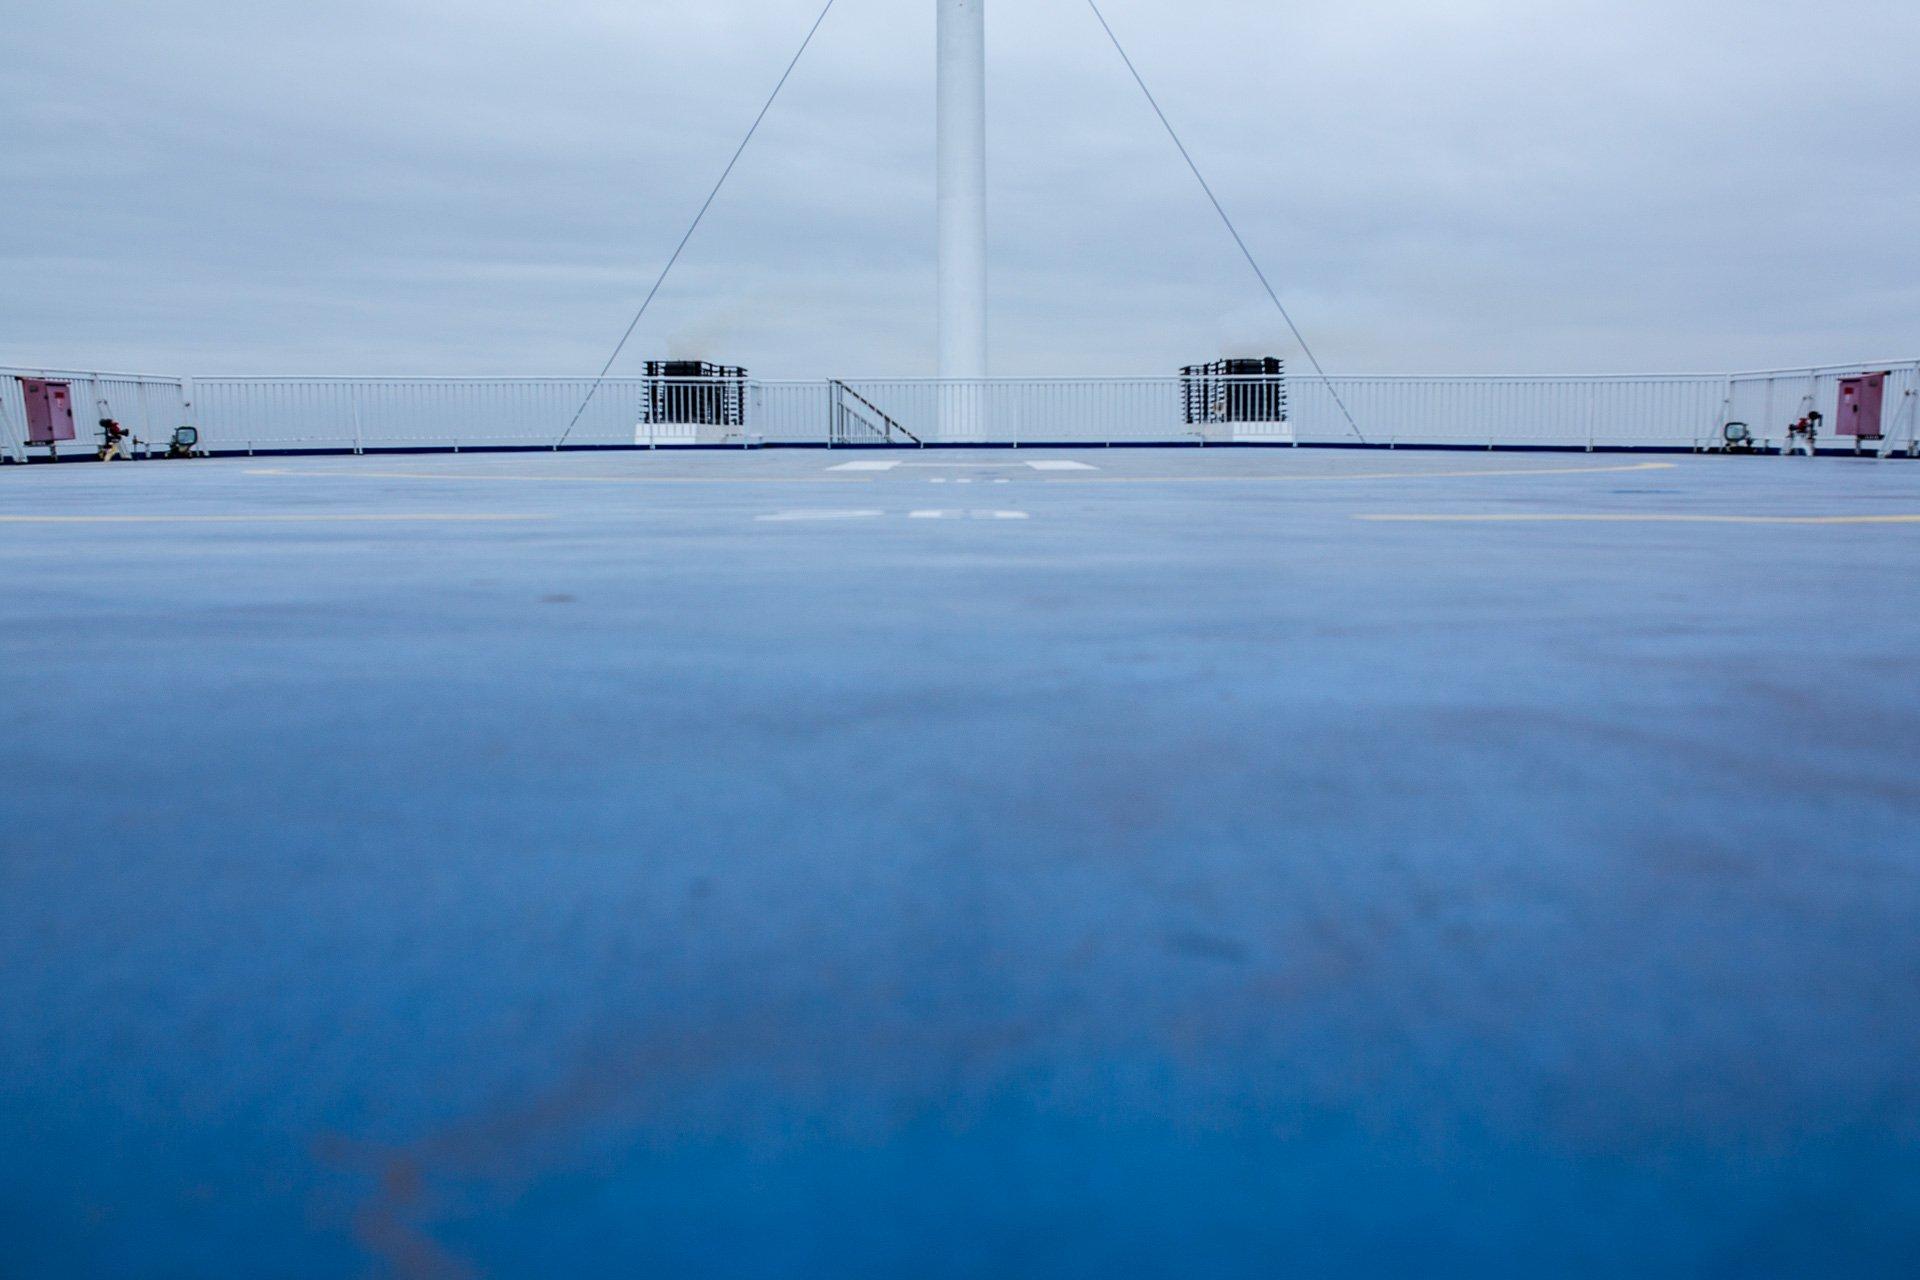 vpPHOTOGRAPHY_170330_Helsinki_WEB_0004